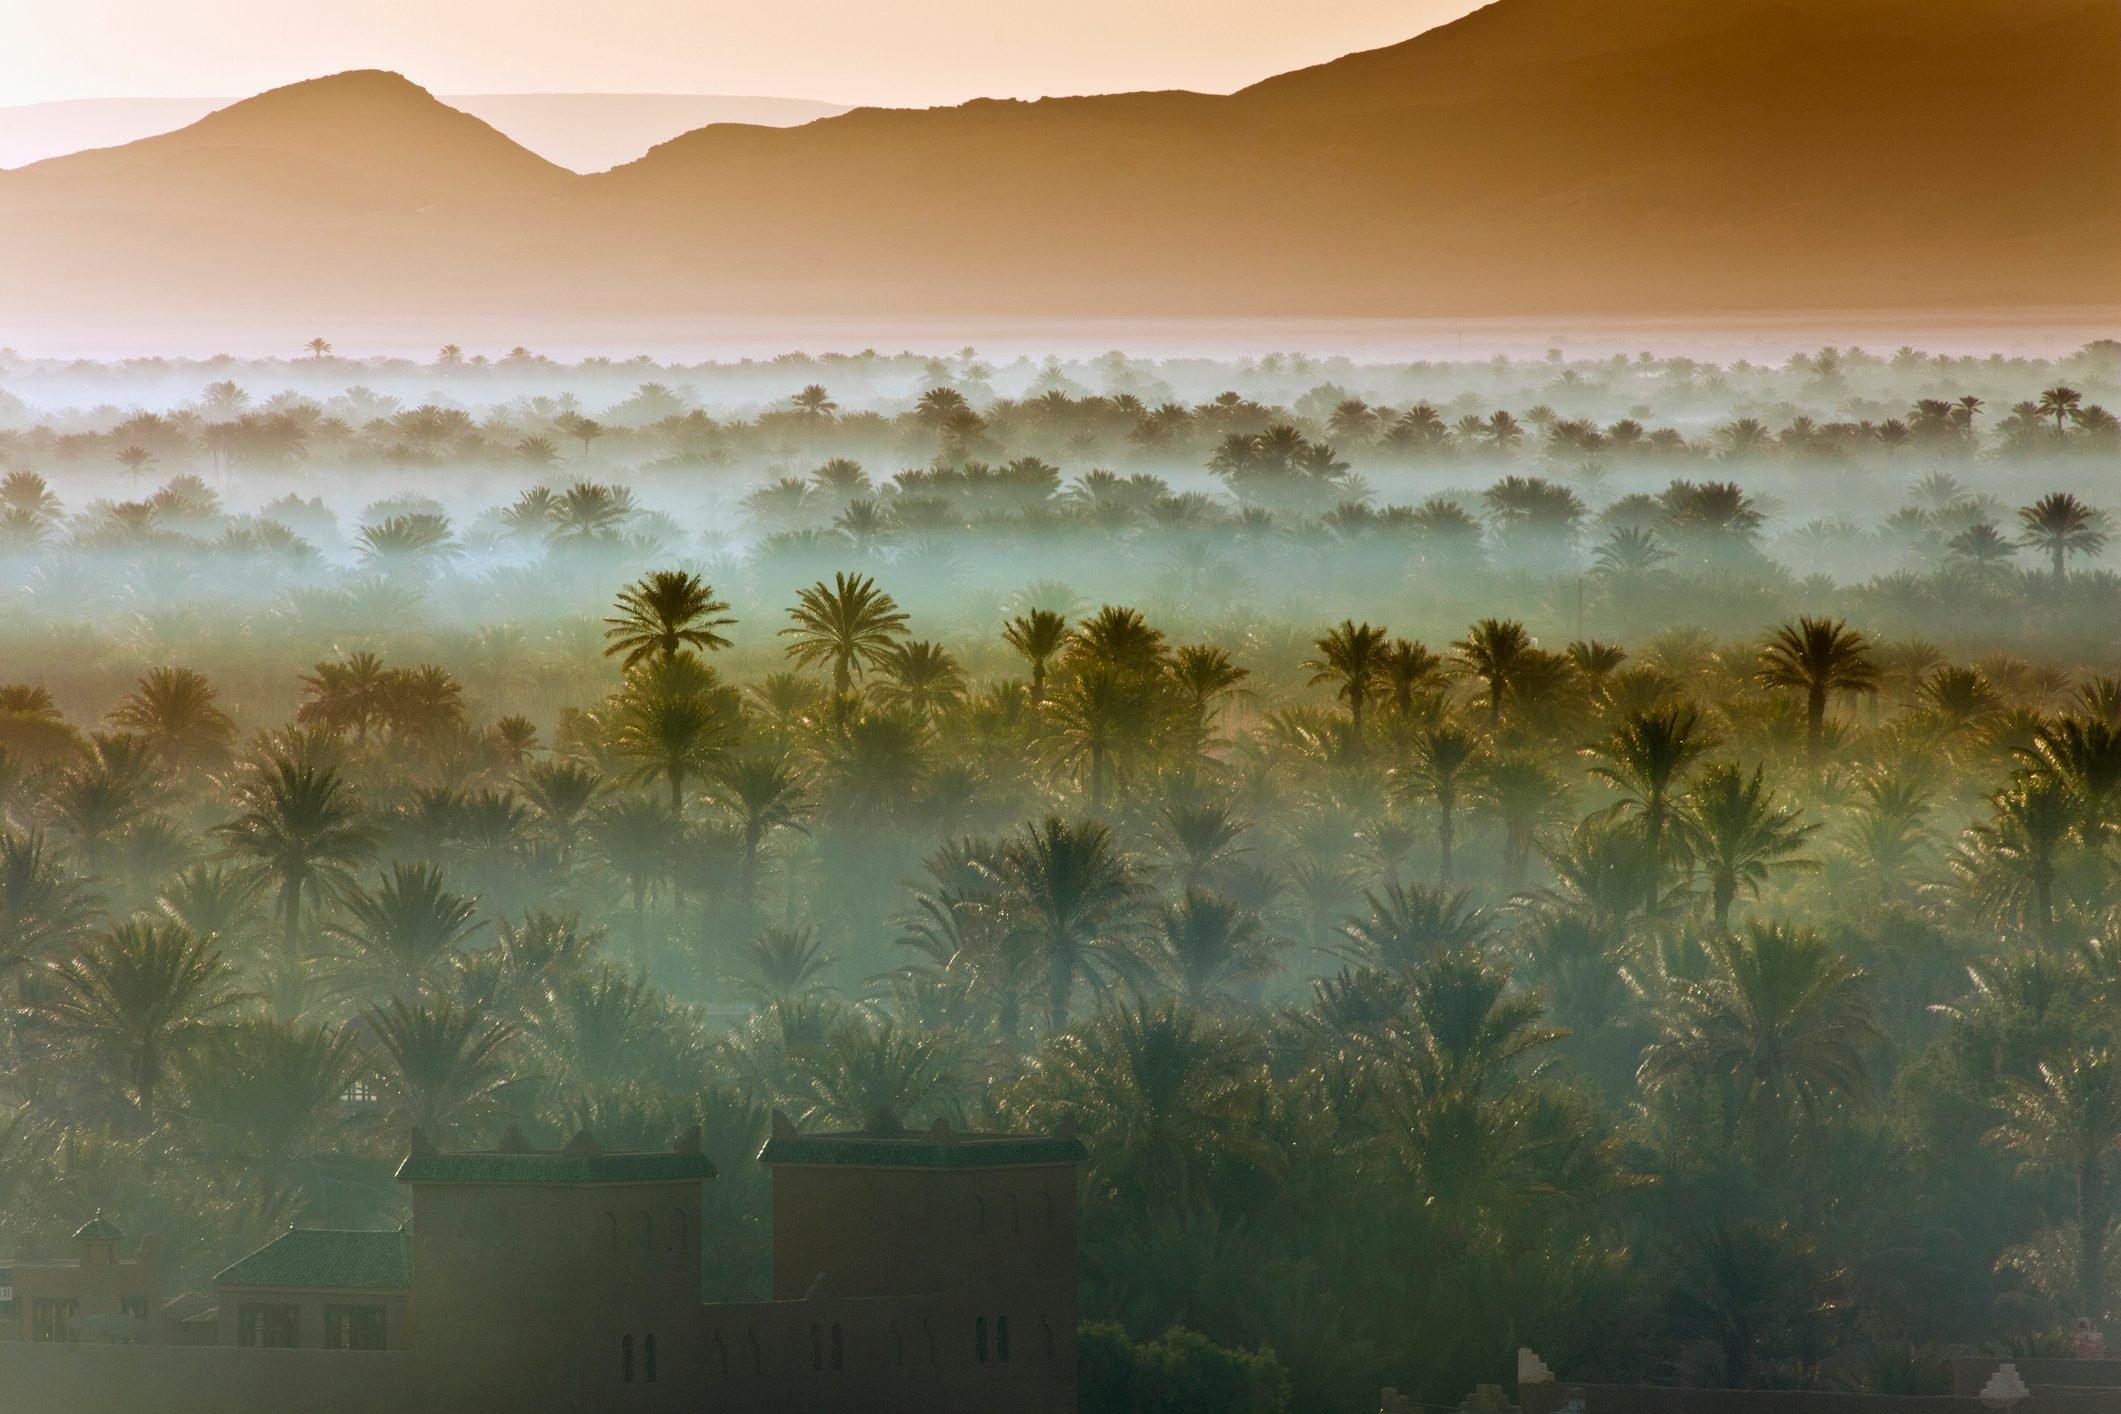 Morocco, near Zagora, Sunrise over Oasis and Palm Trees